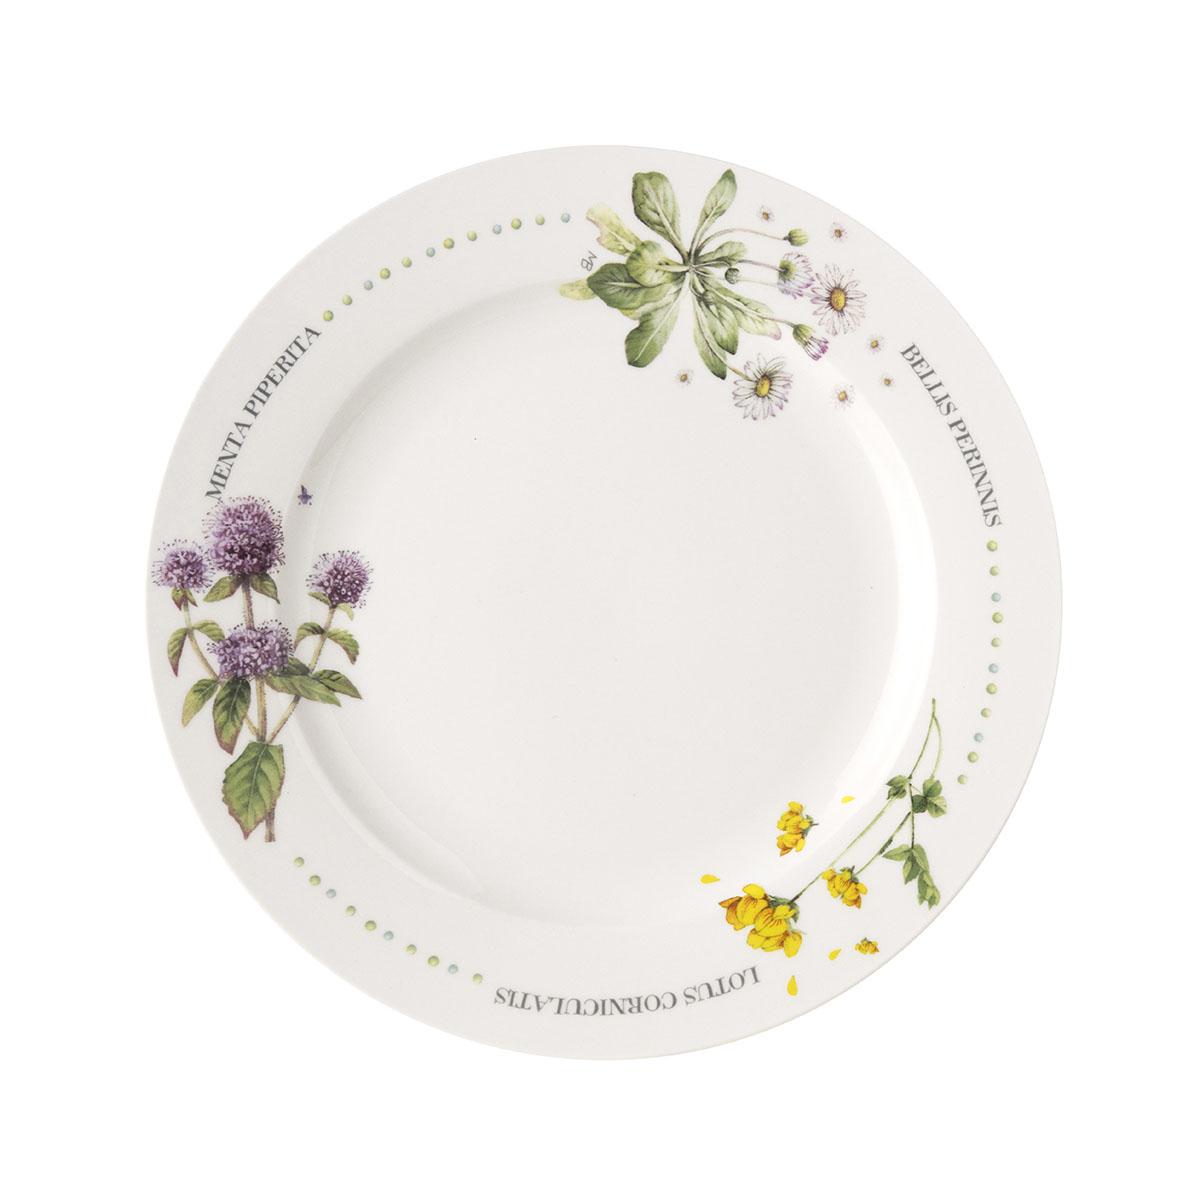 Marjolein Bastin Wildflowers Bord Plat 23 cm Refit